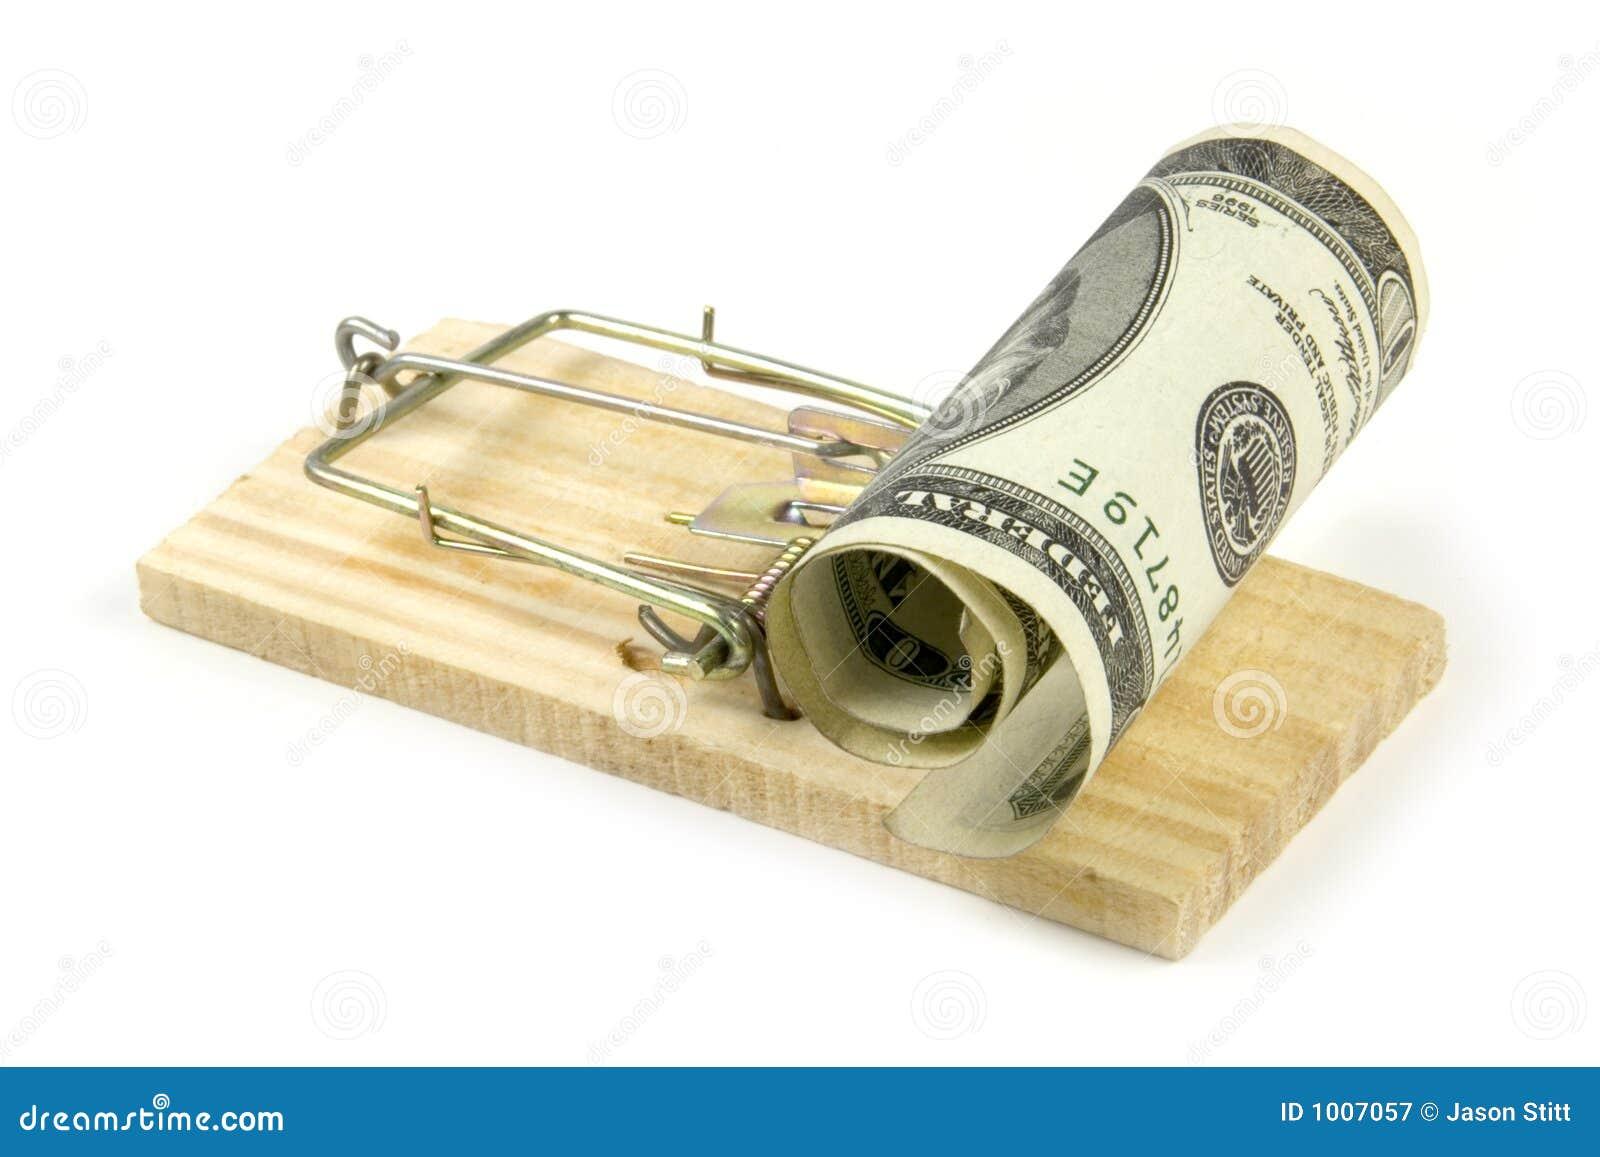 Financial Risk Royalty Free Stock Photography - Image: 1007057 Saudi Money 100